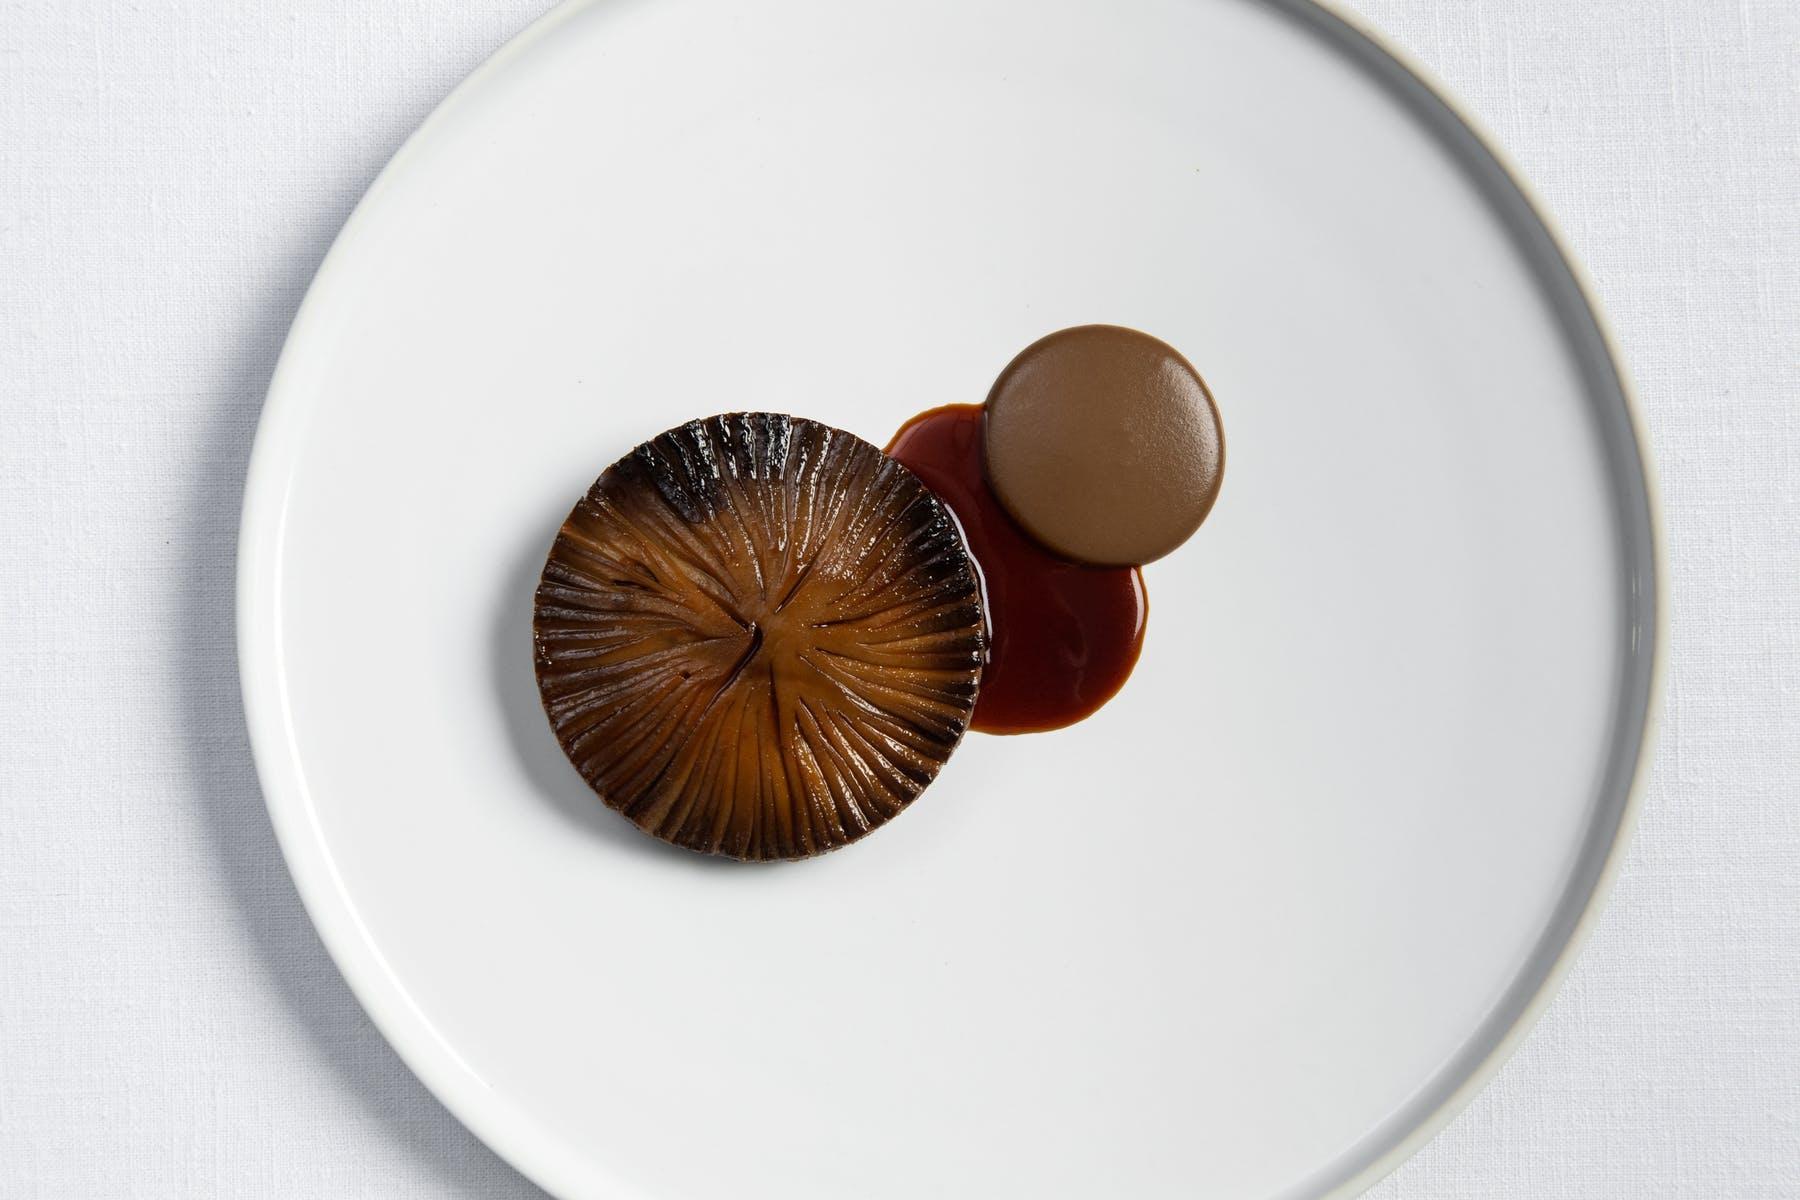 portabella mushroom, leek and shiso